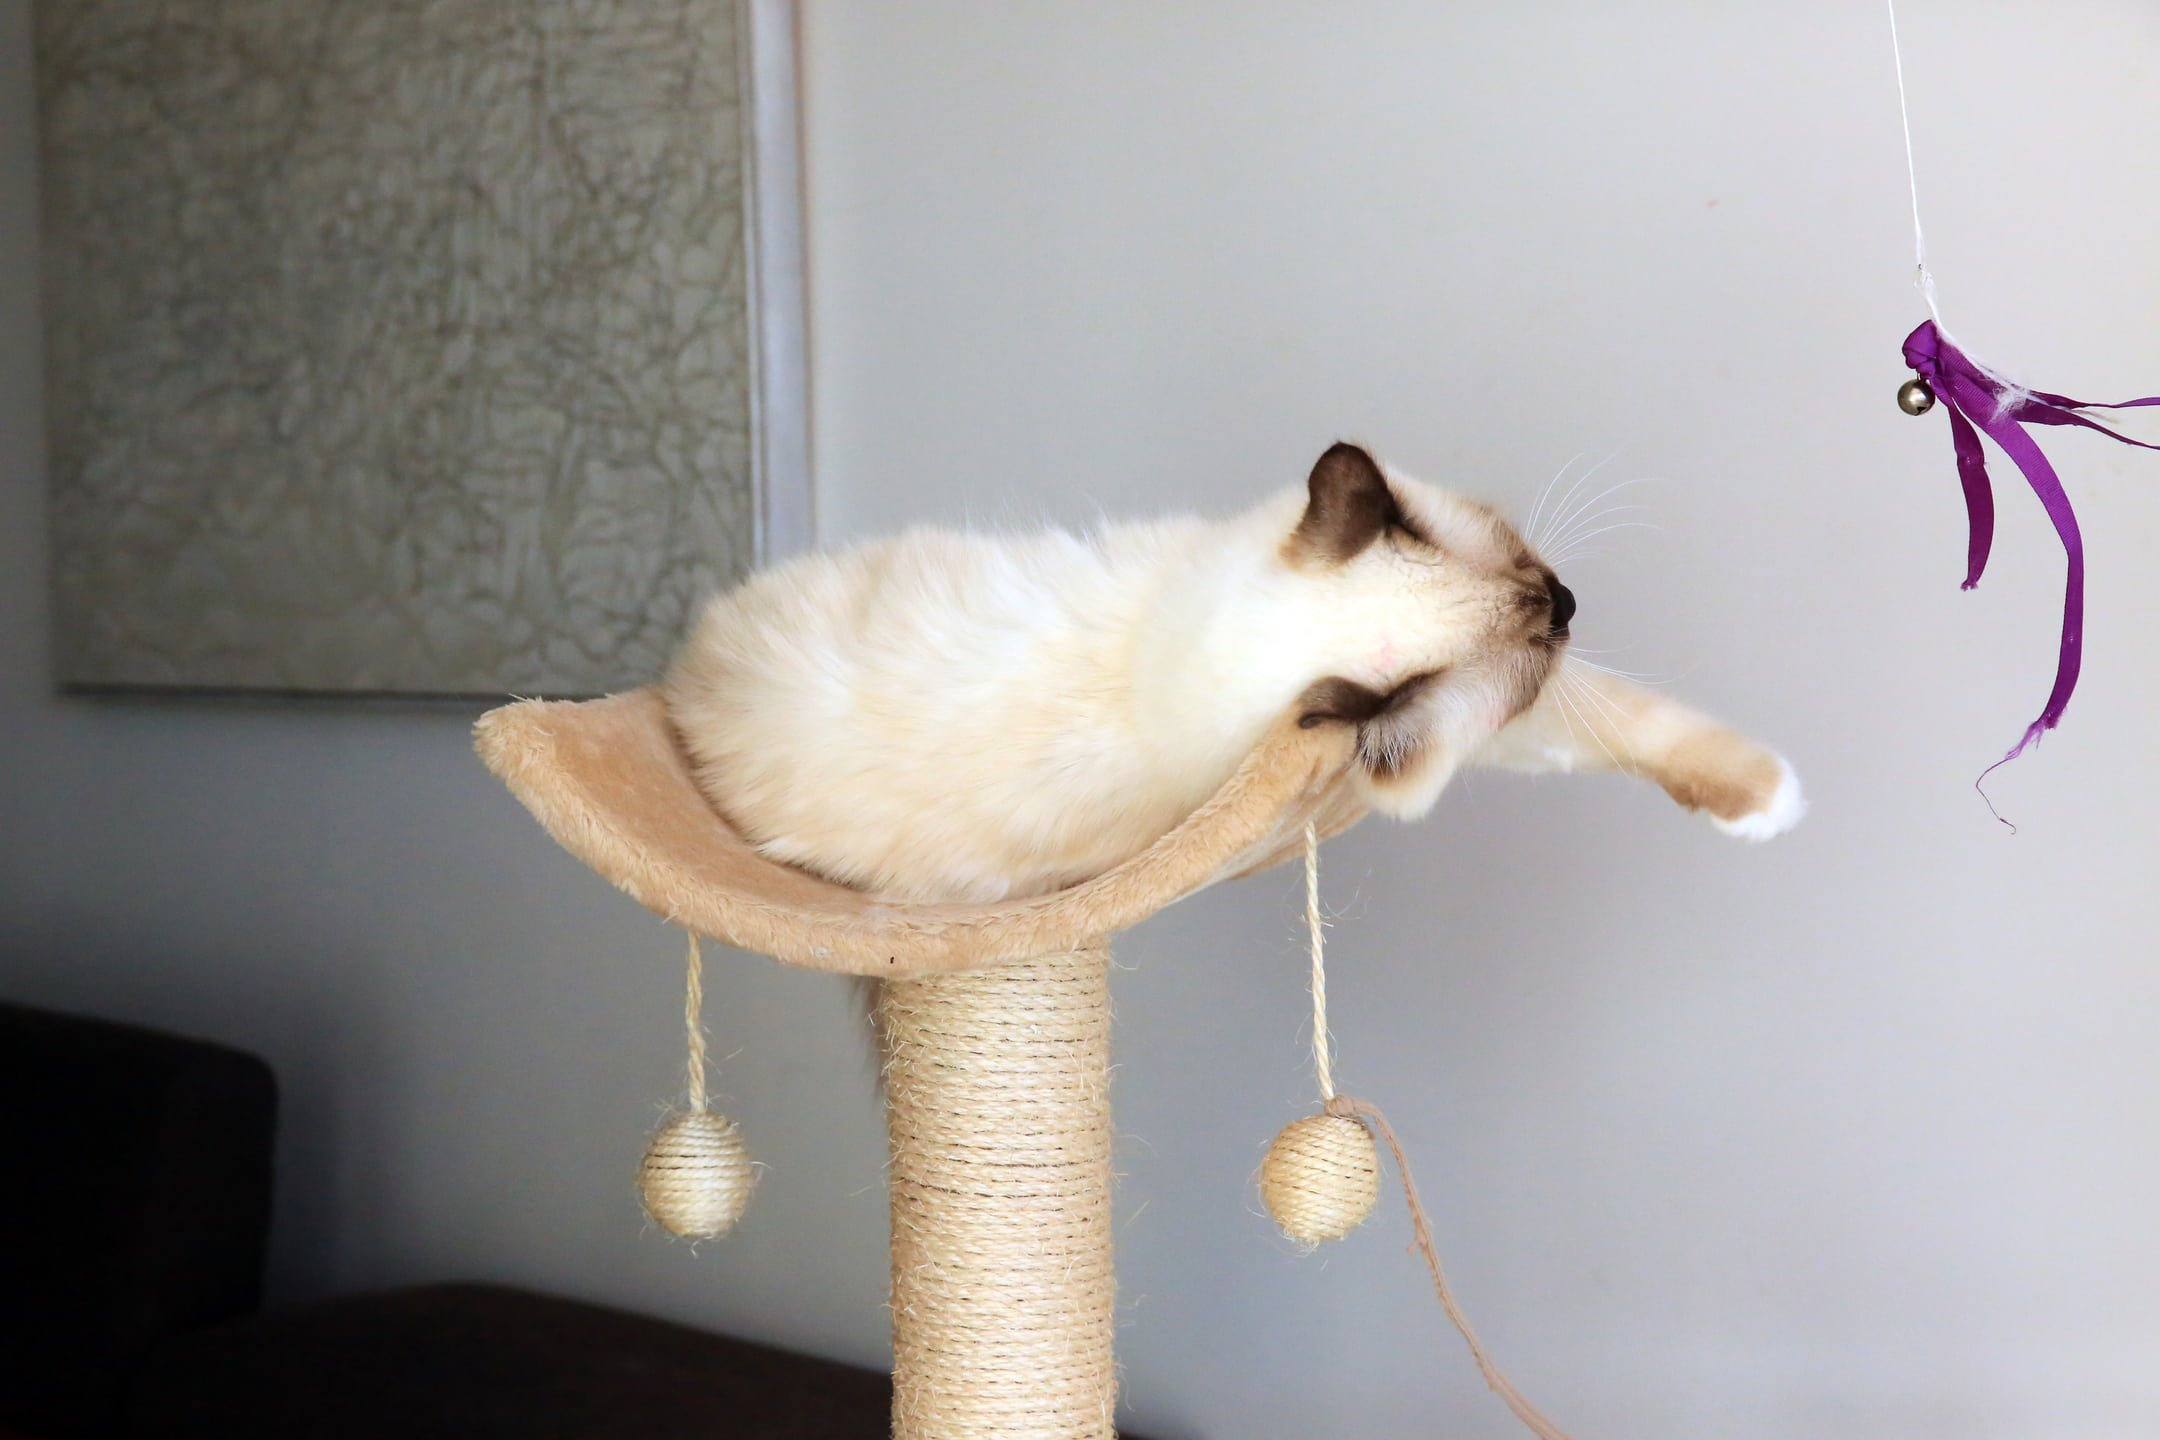 Keeping an Indoor Cat Happy - Purrfect Love